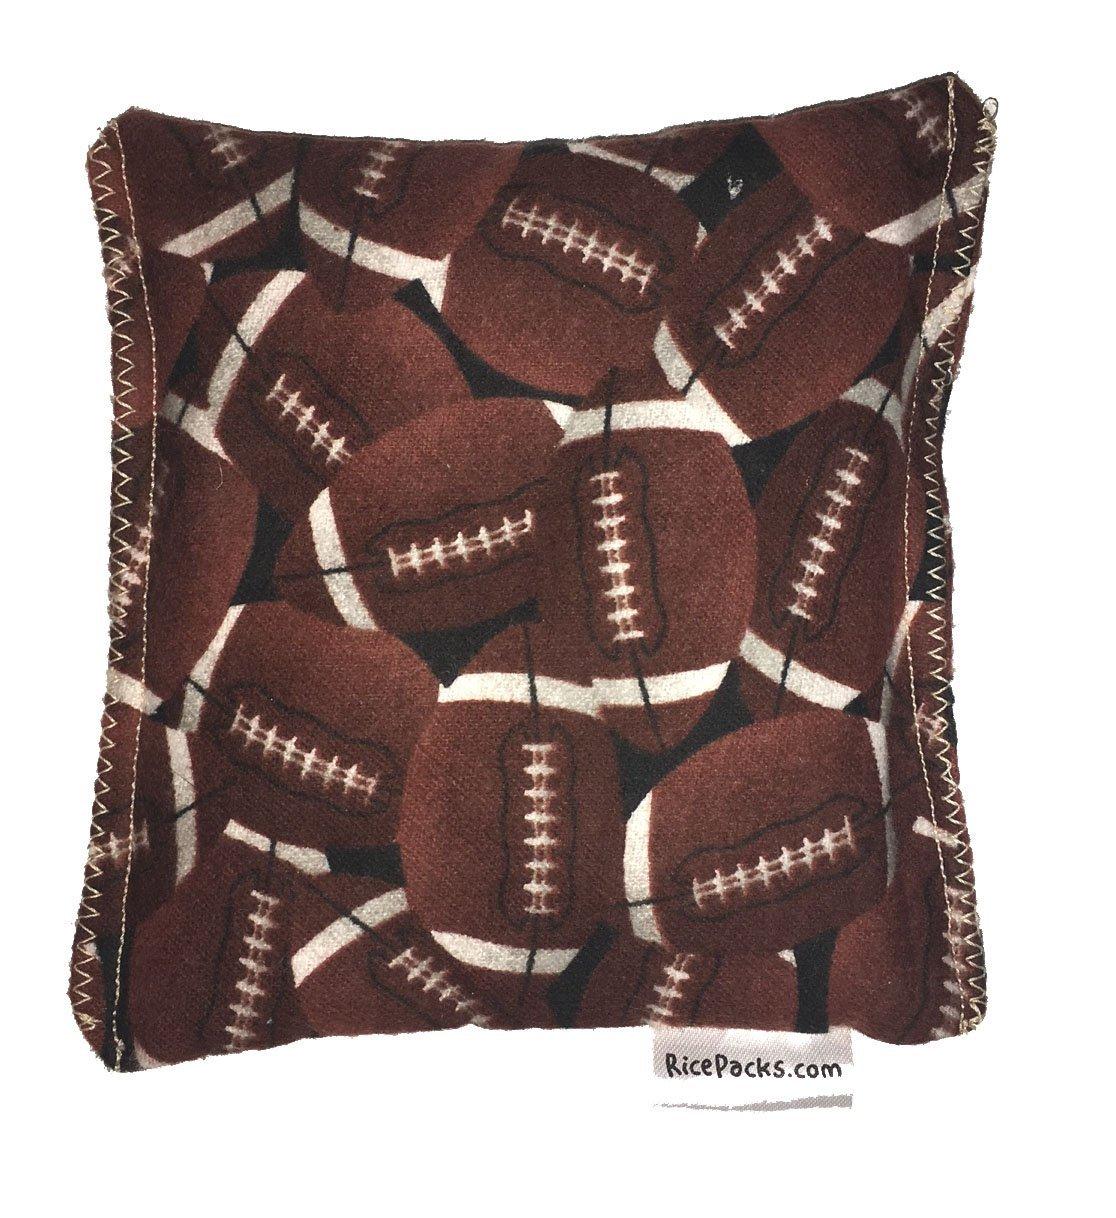 Football 2 Boo-Boo Bags Hot/Cold Packs Reusable Ouchee Heat Packs Hot Cold Pack Microwave Heating Pad Reusable Ice Pack , Hot Therapy, Cold Therapy, Rice Pack, Booboo Pillow